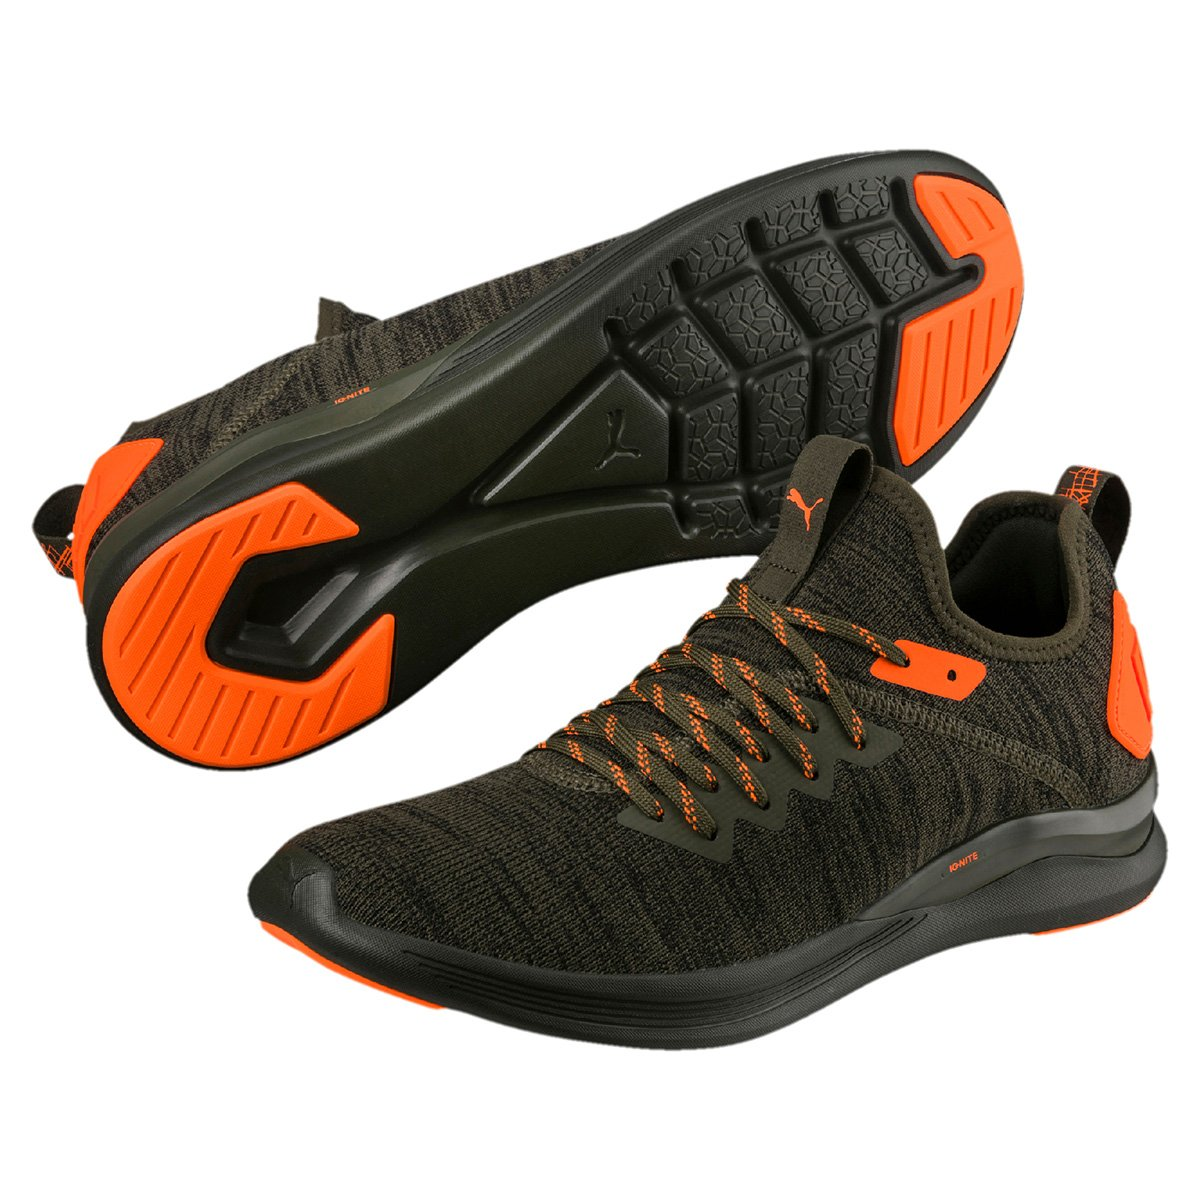 baa1160c34caa FornecedorNetshoes. Tênis Puma Ignite Flash Evoknit Unrest Masculino